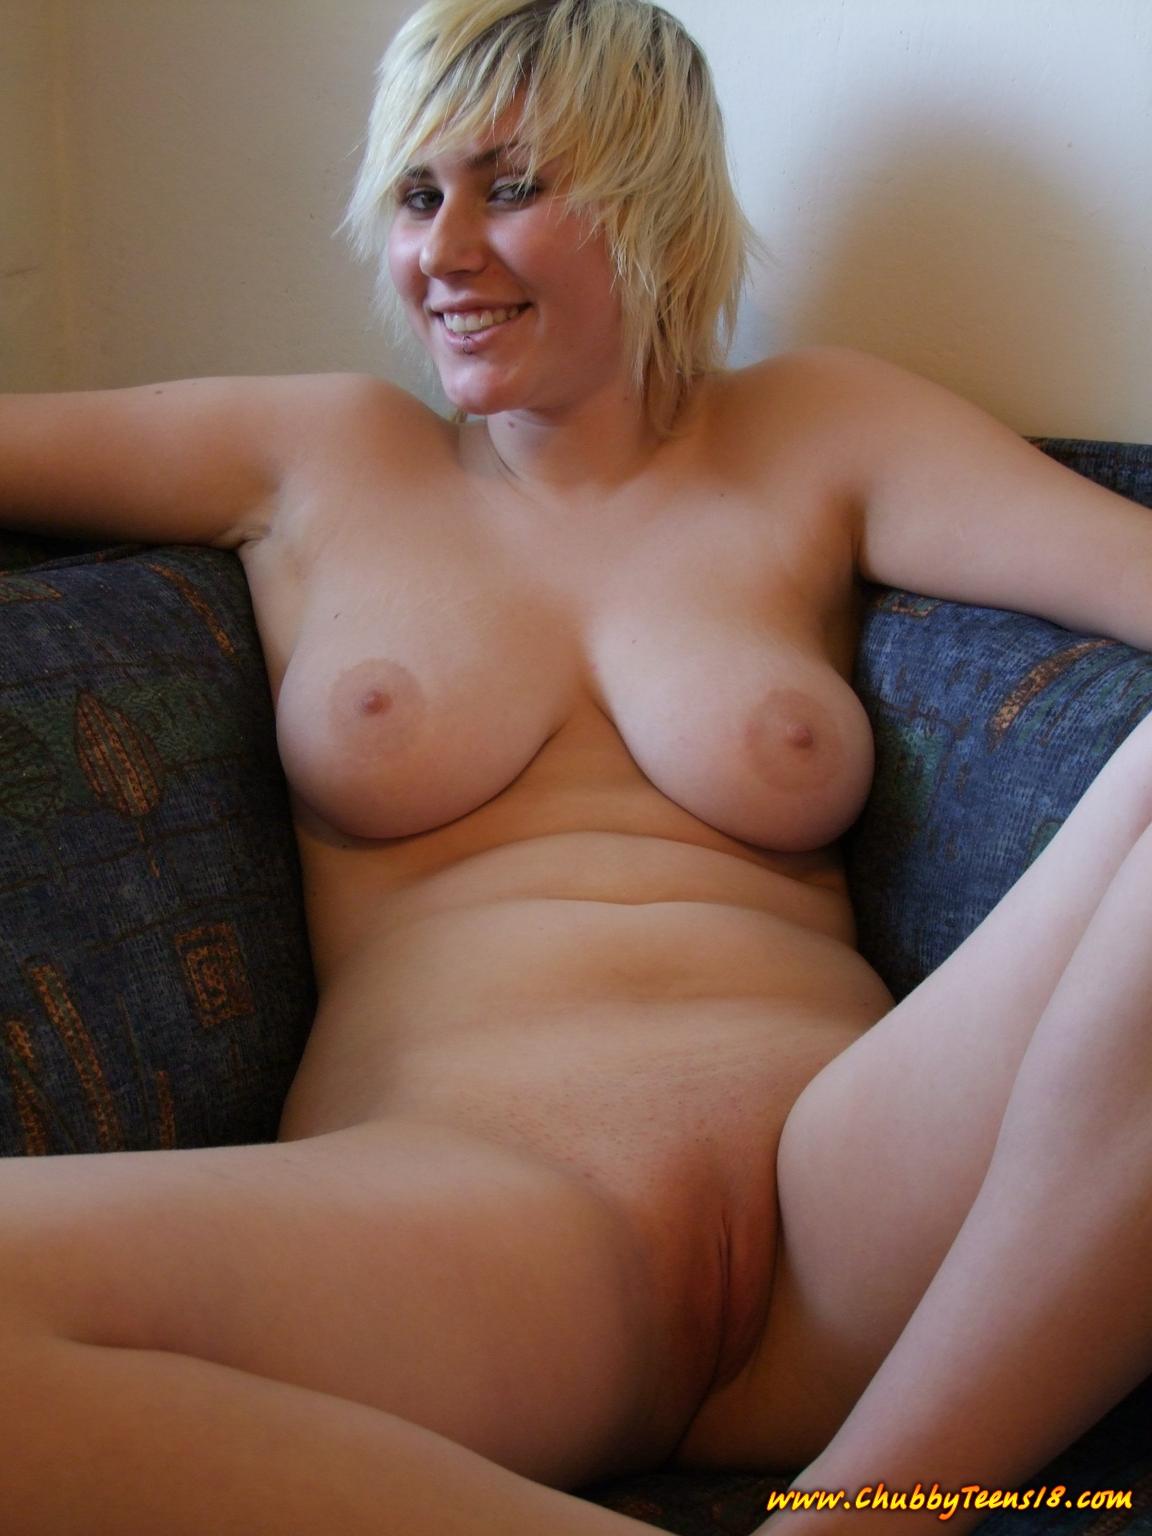 Bbw Teen Sittin Porn Video sexy young chubby - megapornx